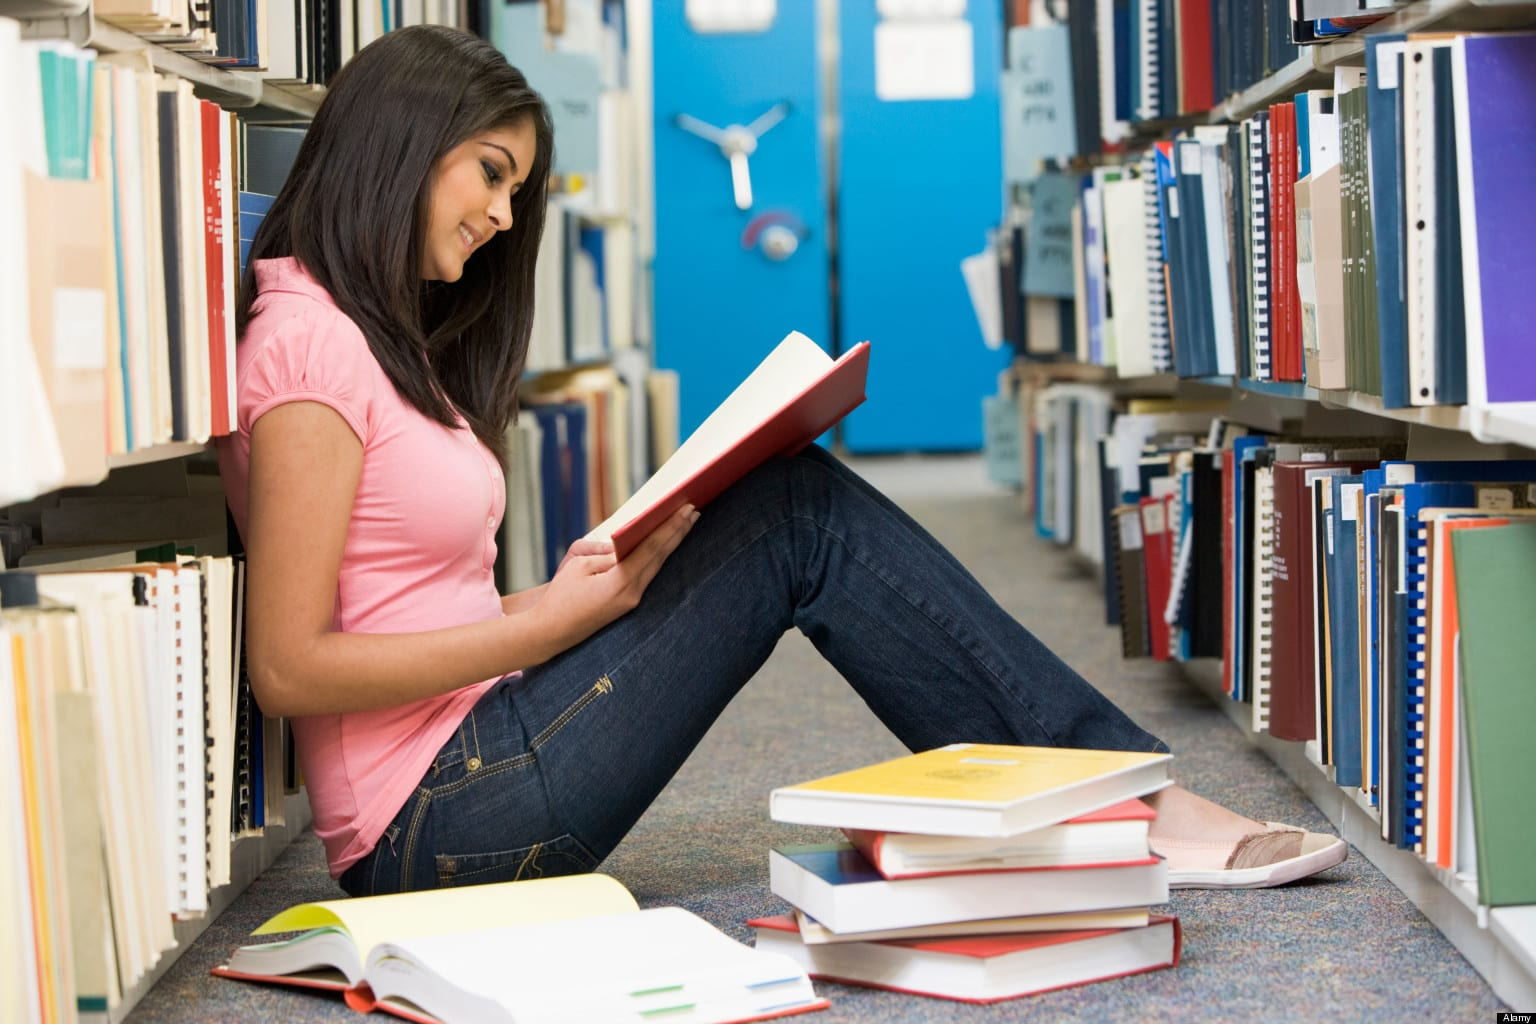 Alumna secundaria respetando la biblioteca